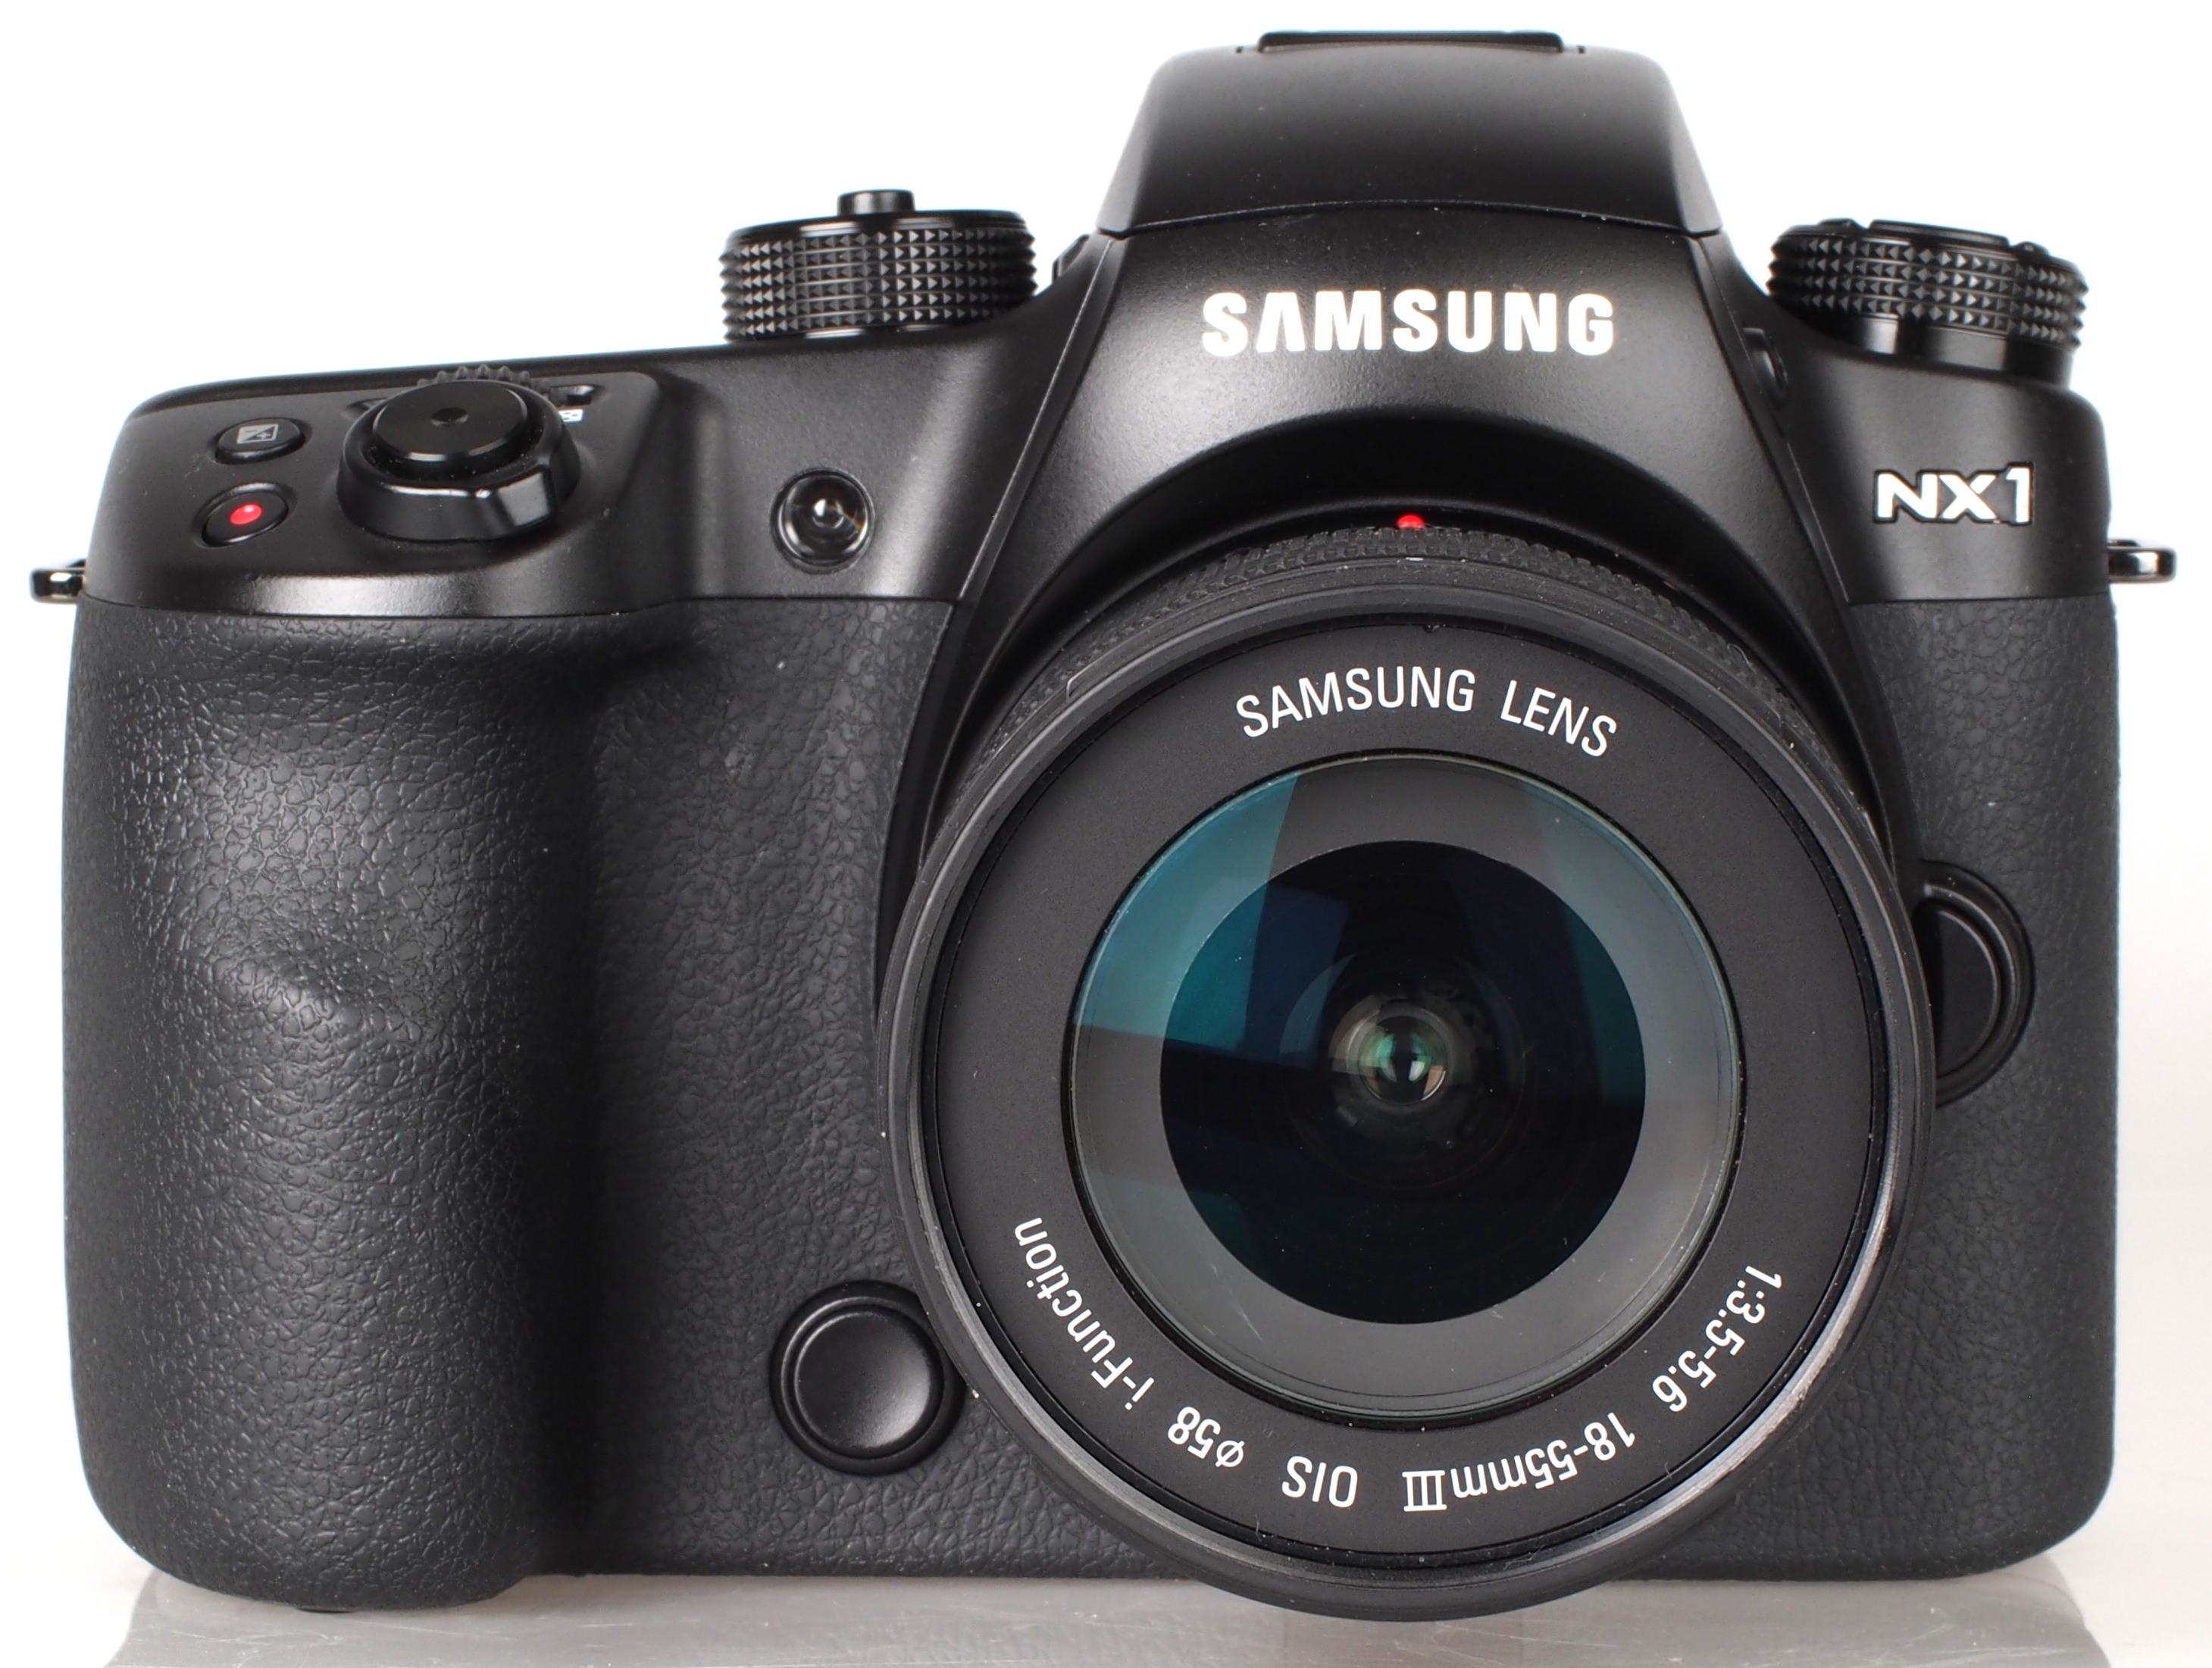 Samsung NX1 Expert Review | ePHOTOzine